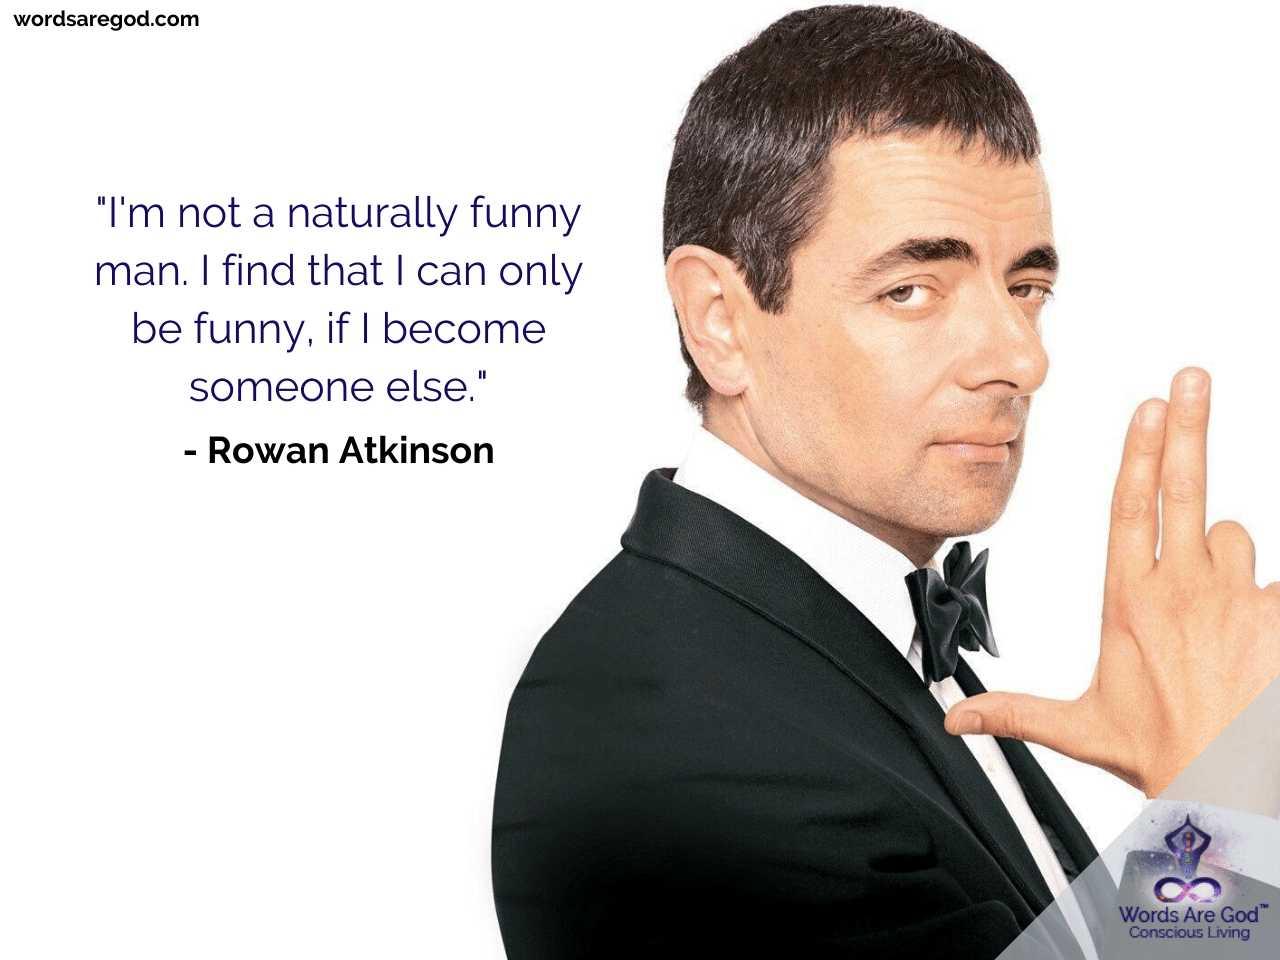 Rowan Atkinson Best Quotes by Rowan Atkinson